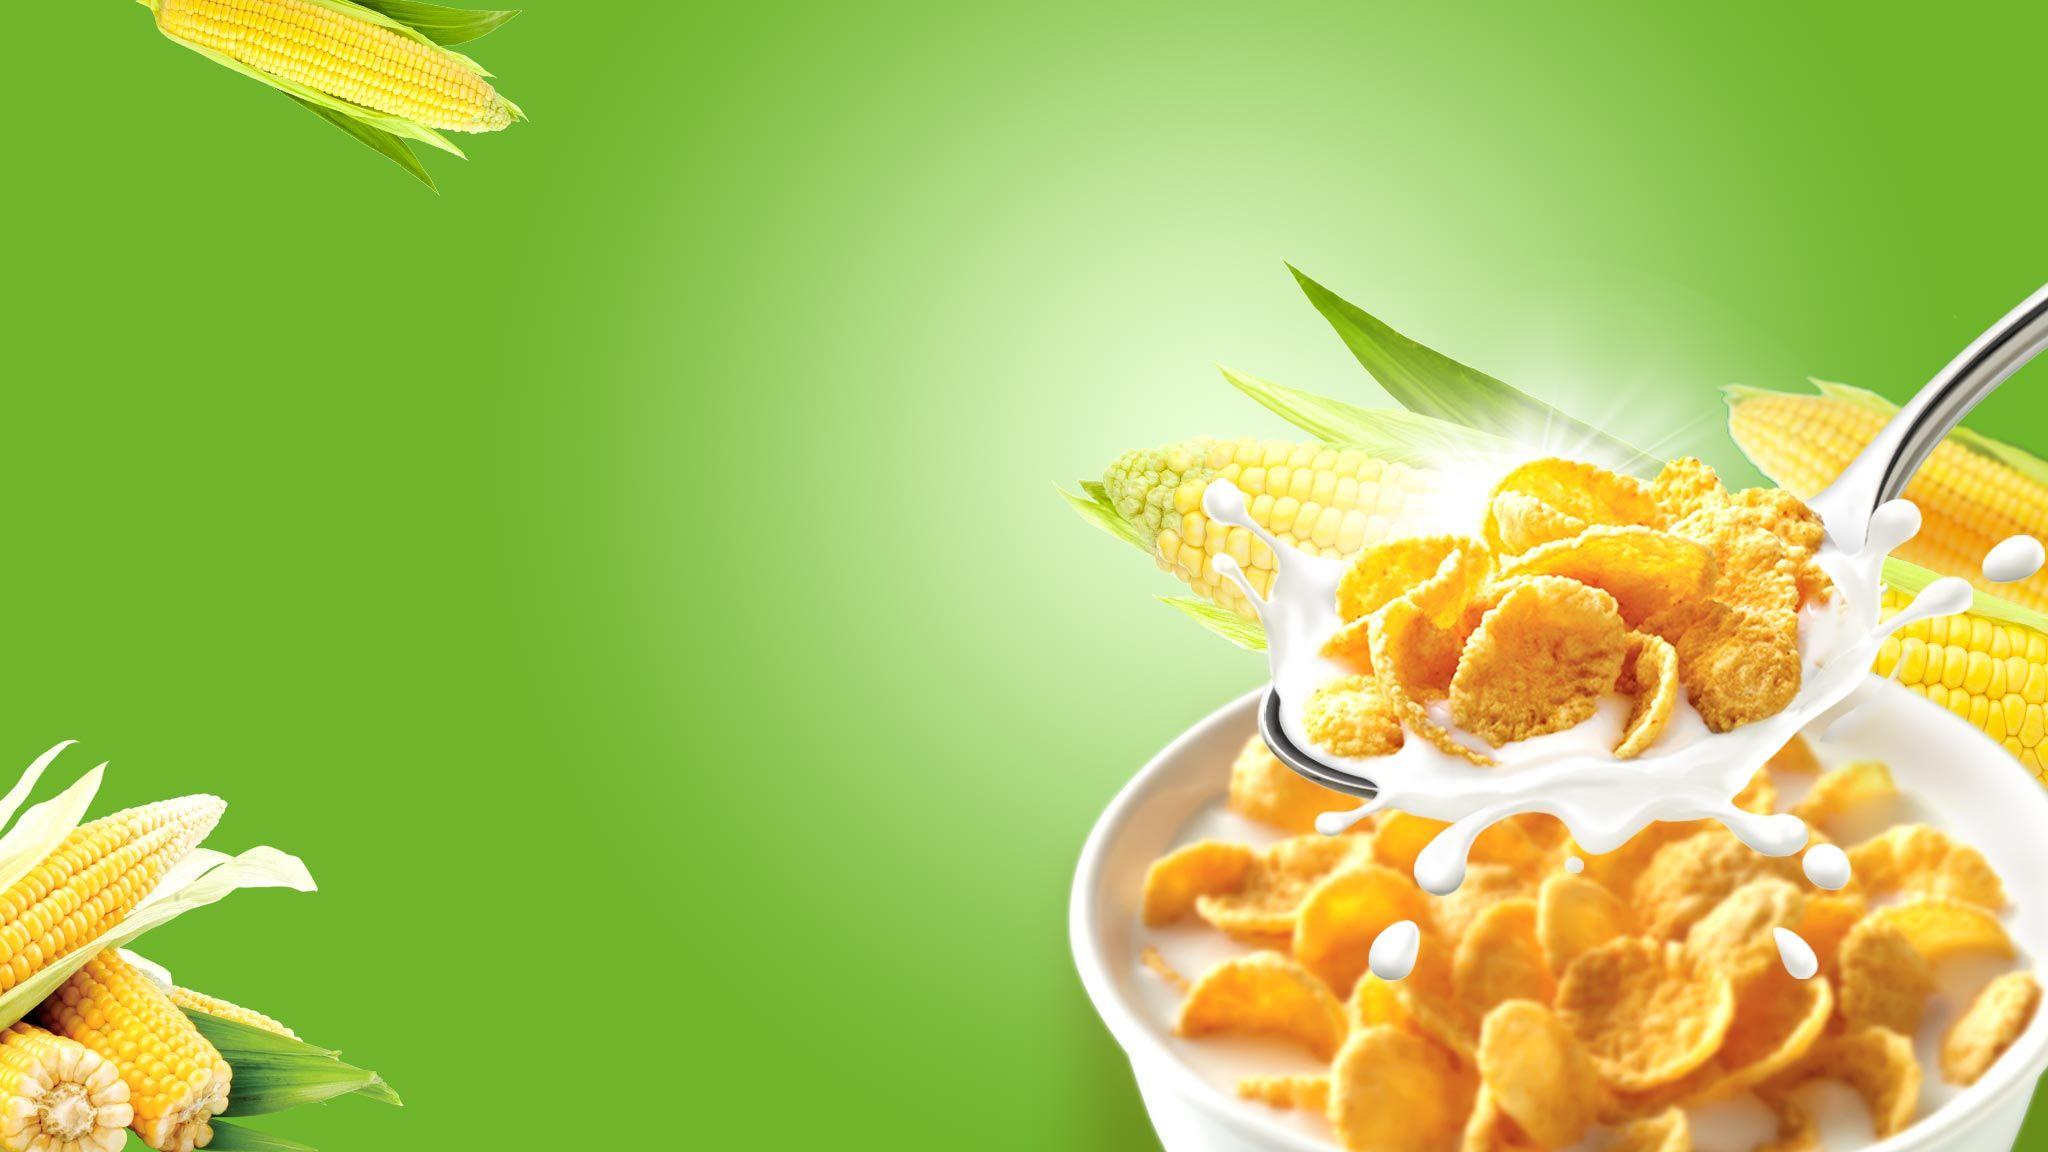 Corn new wallpaper